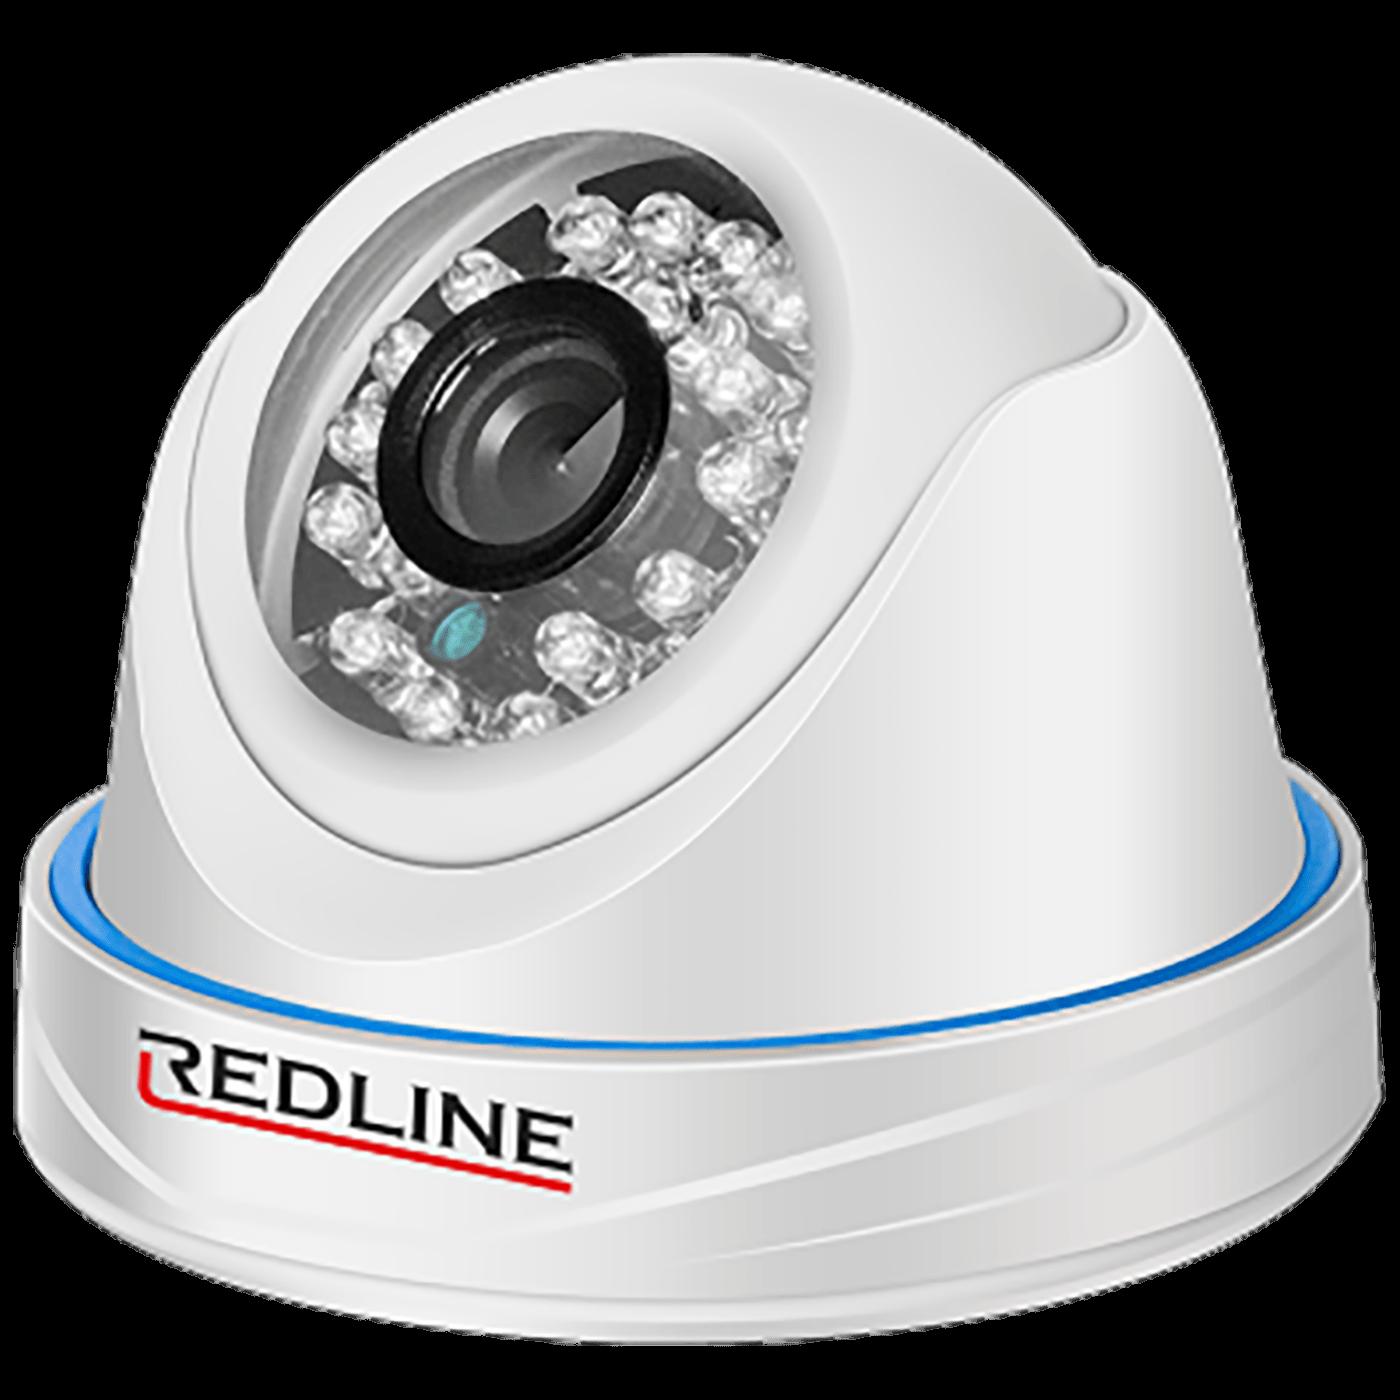 Dome kamera, 2.0Mpixel, HD lens 3,6mm